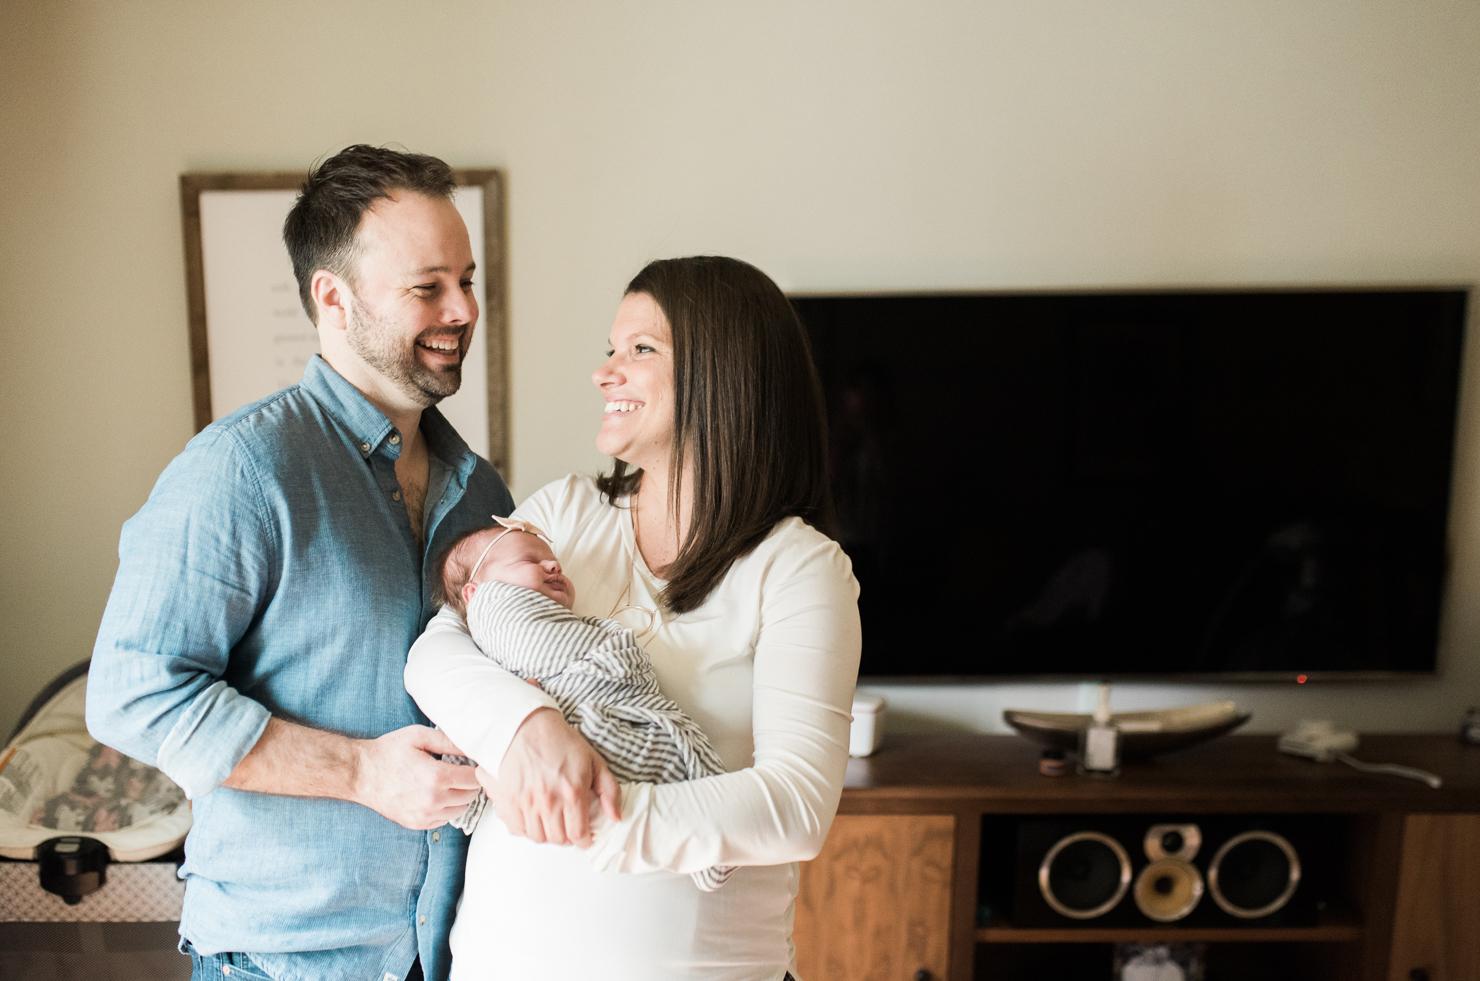 Newborn-photographer-BKLP-Baltimore-Maryland-Brooklyn-New York-lifestyle-photography-Breanna Kuhlmann-15.jpg